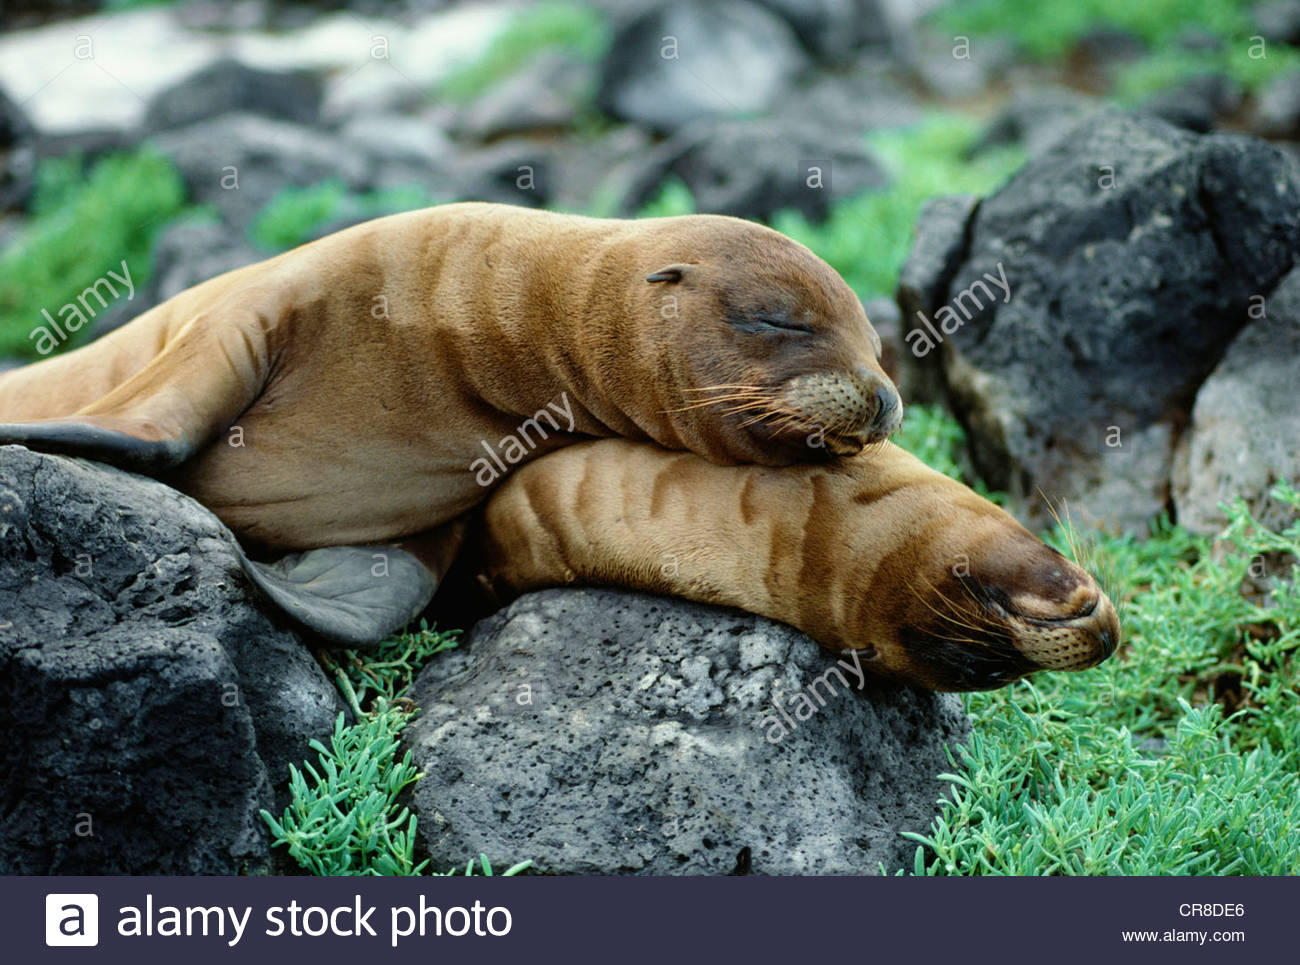 Galapagos Sea Lions, Galapagos-Inseln, Ecuador Stockbild